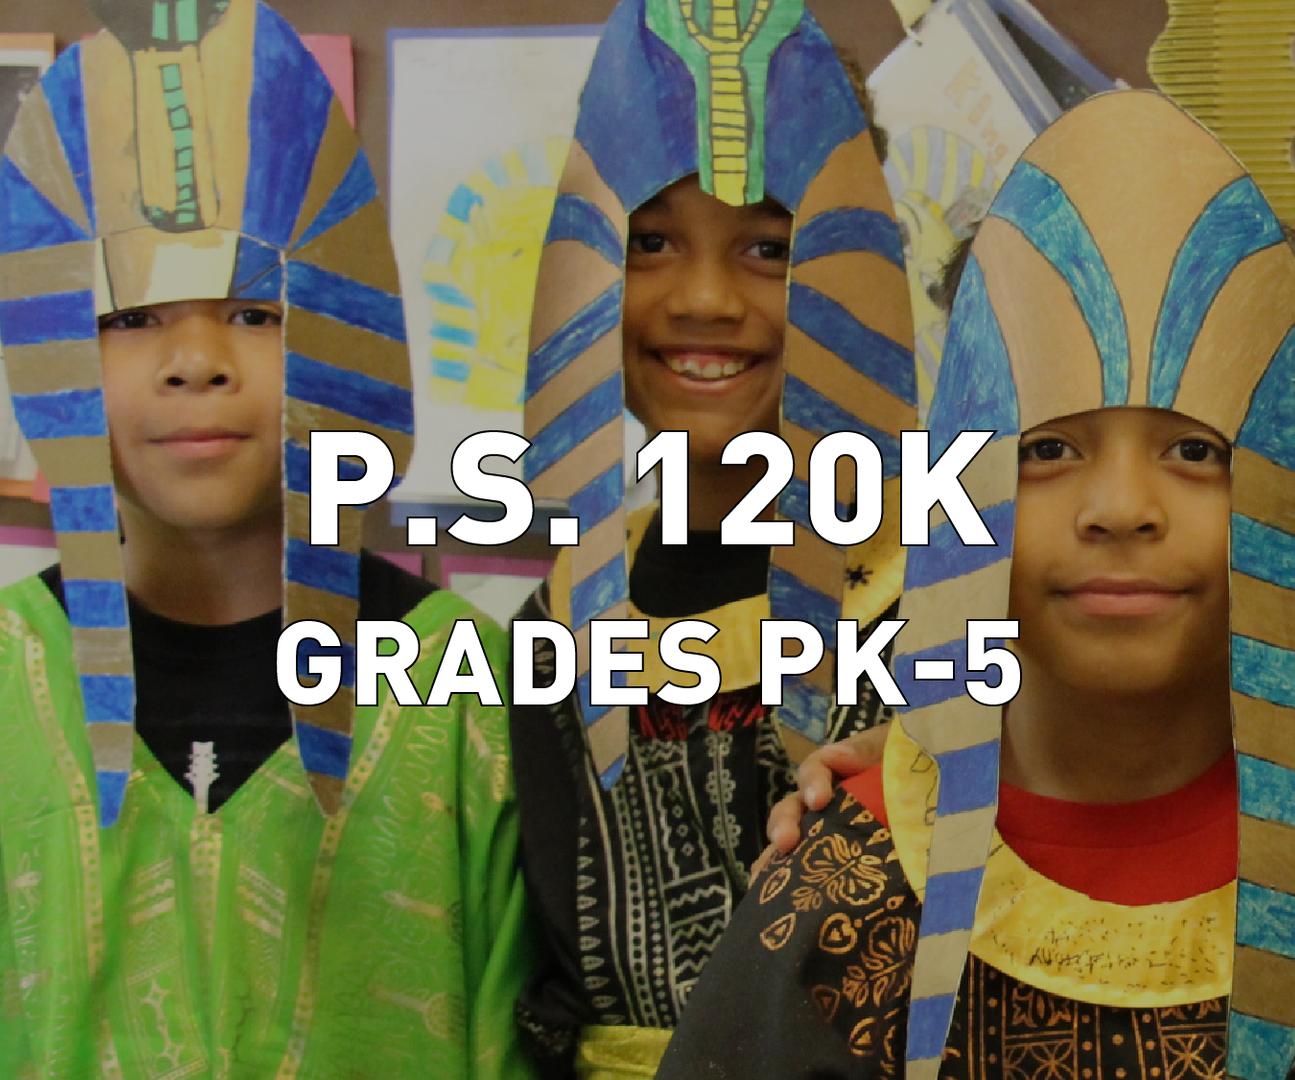 P.S. 120K Grades PK-5